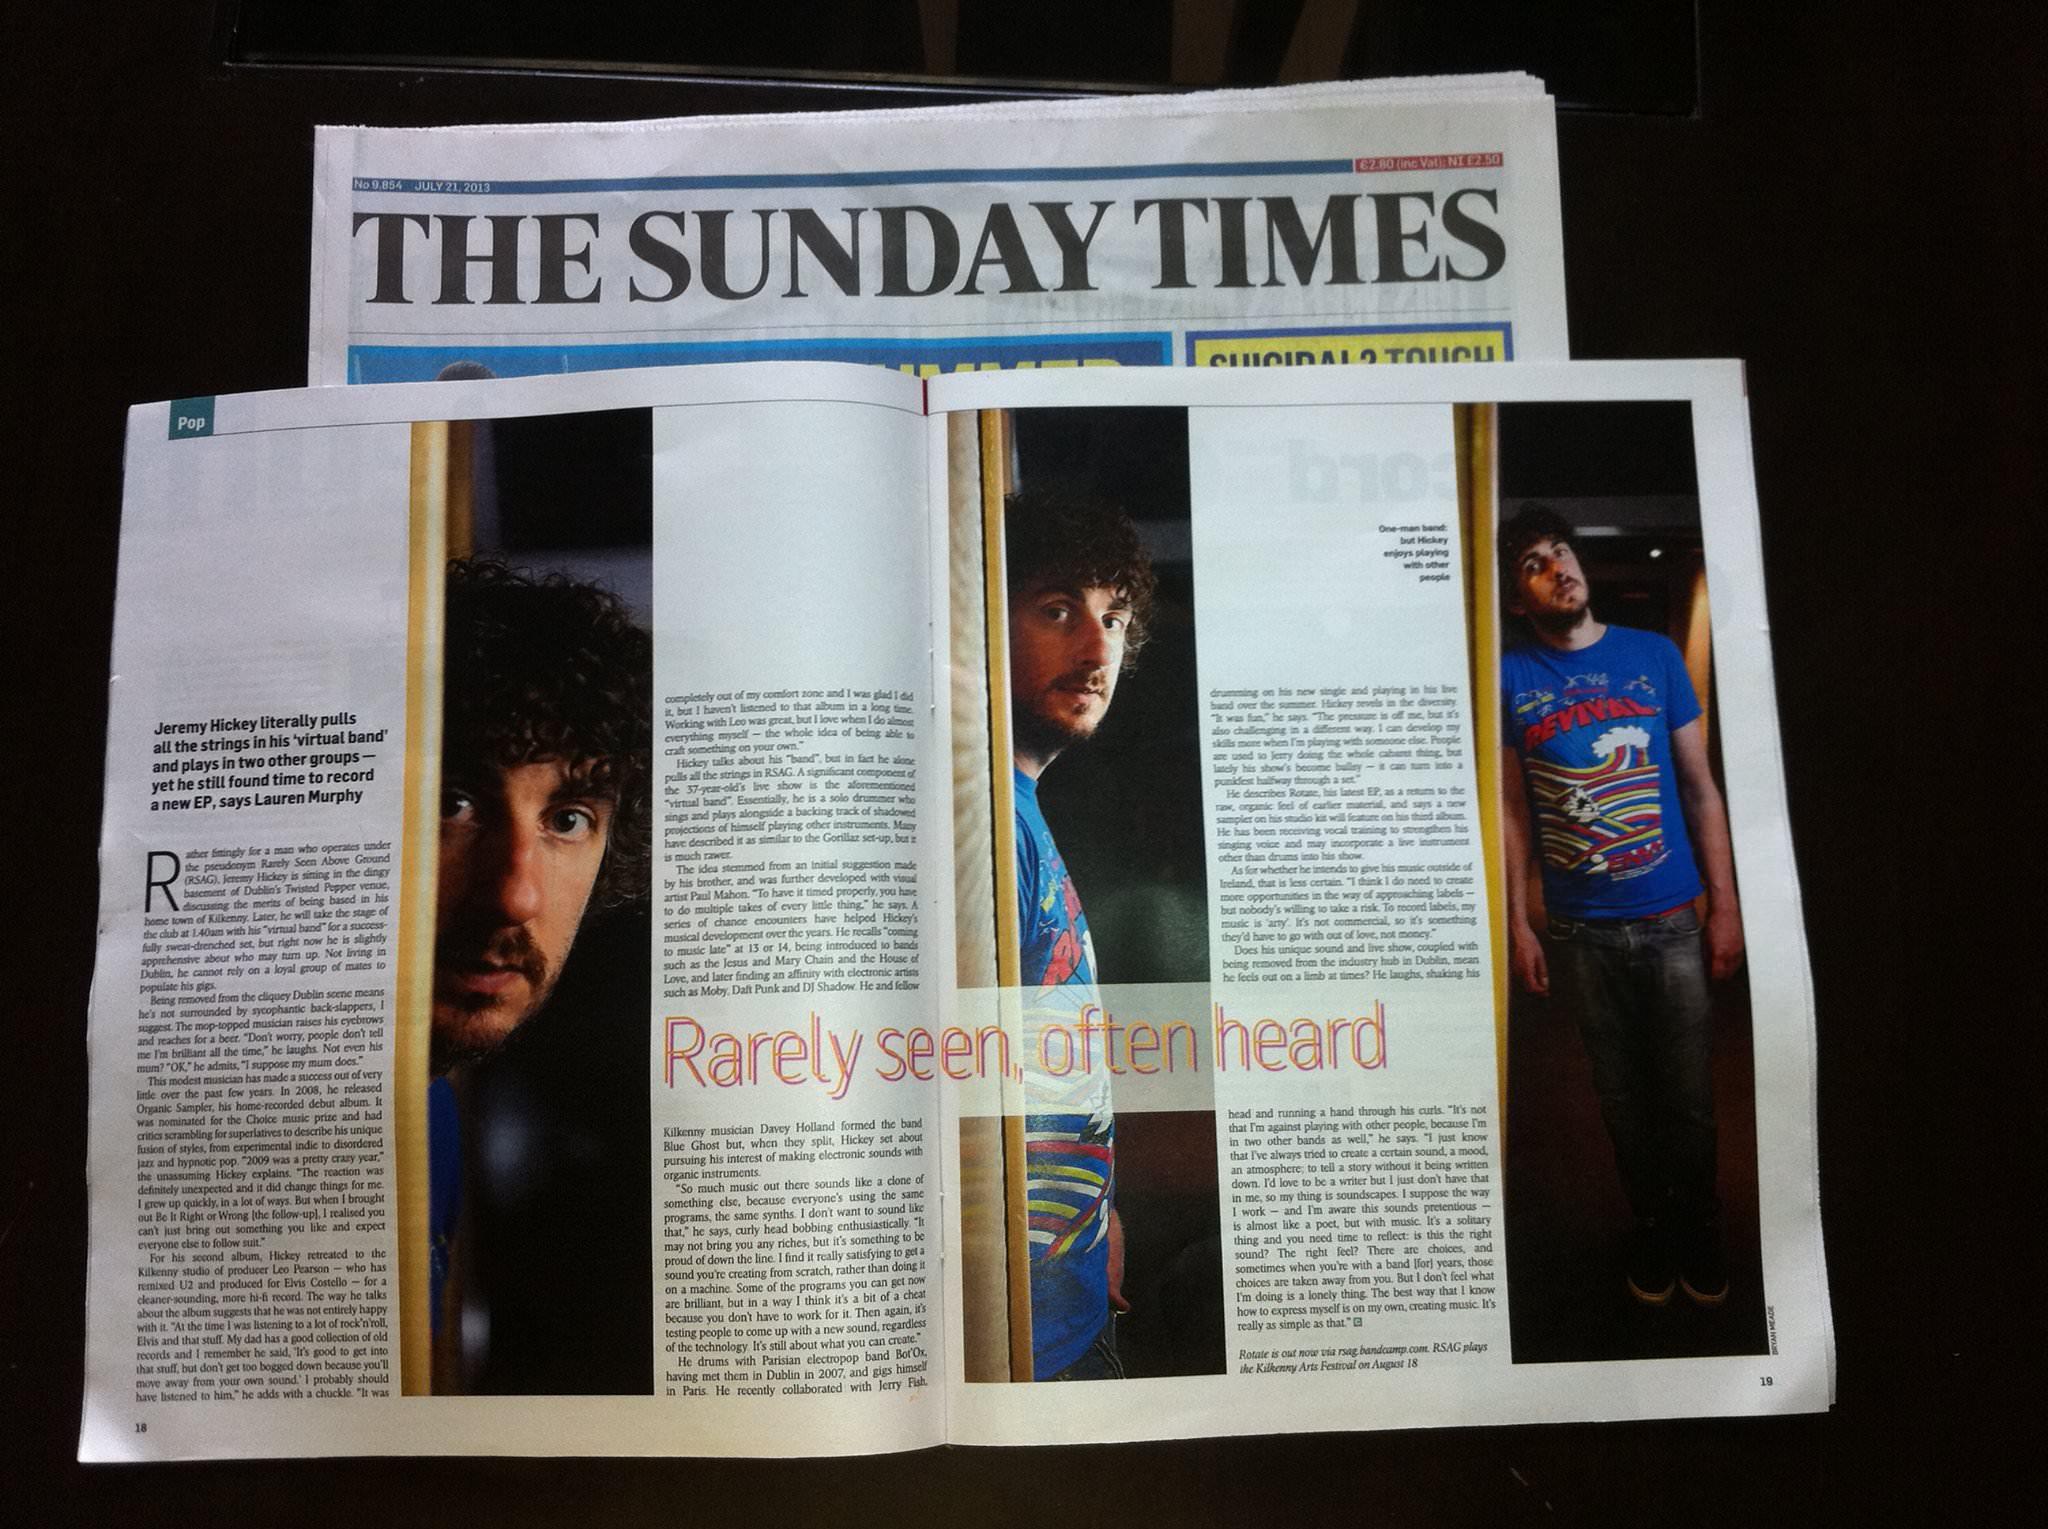 RSAG The Sunday Times.jpg